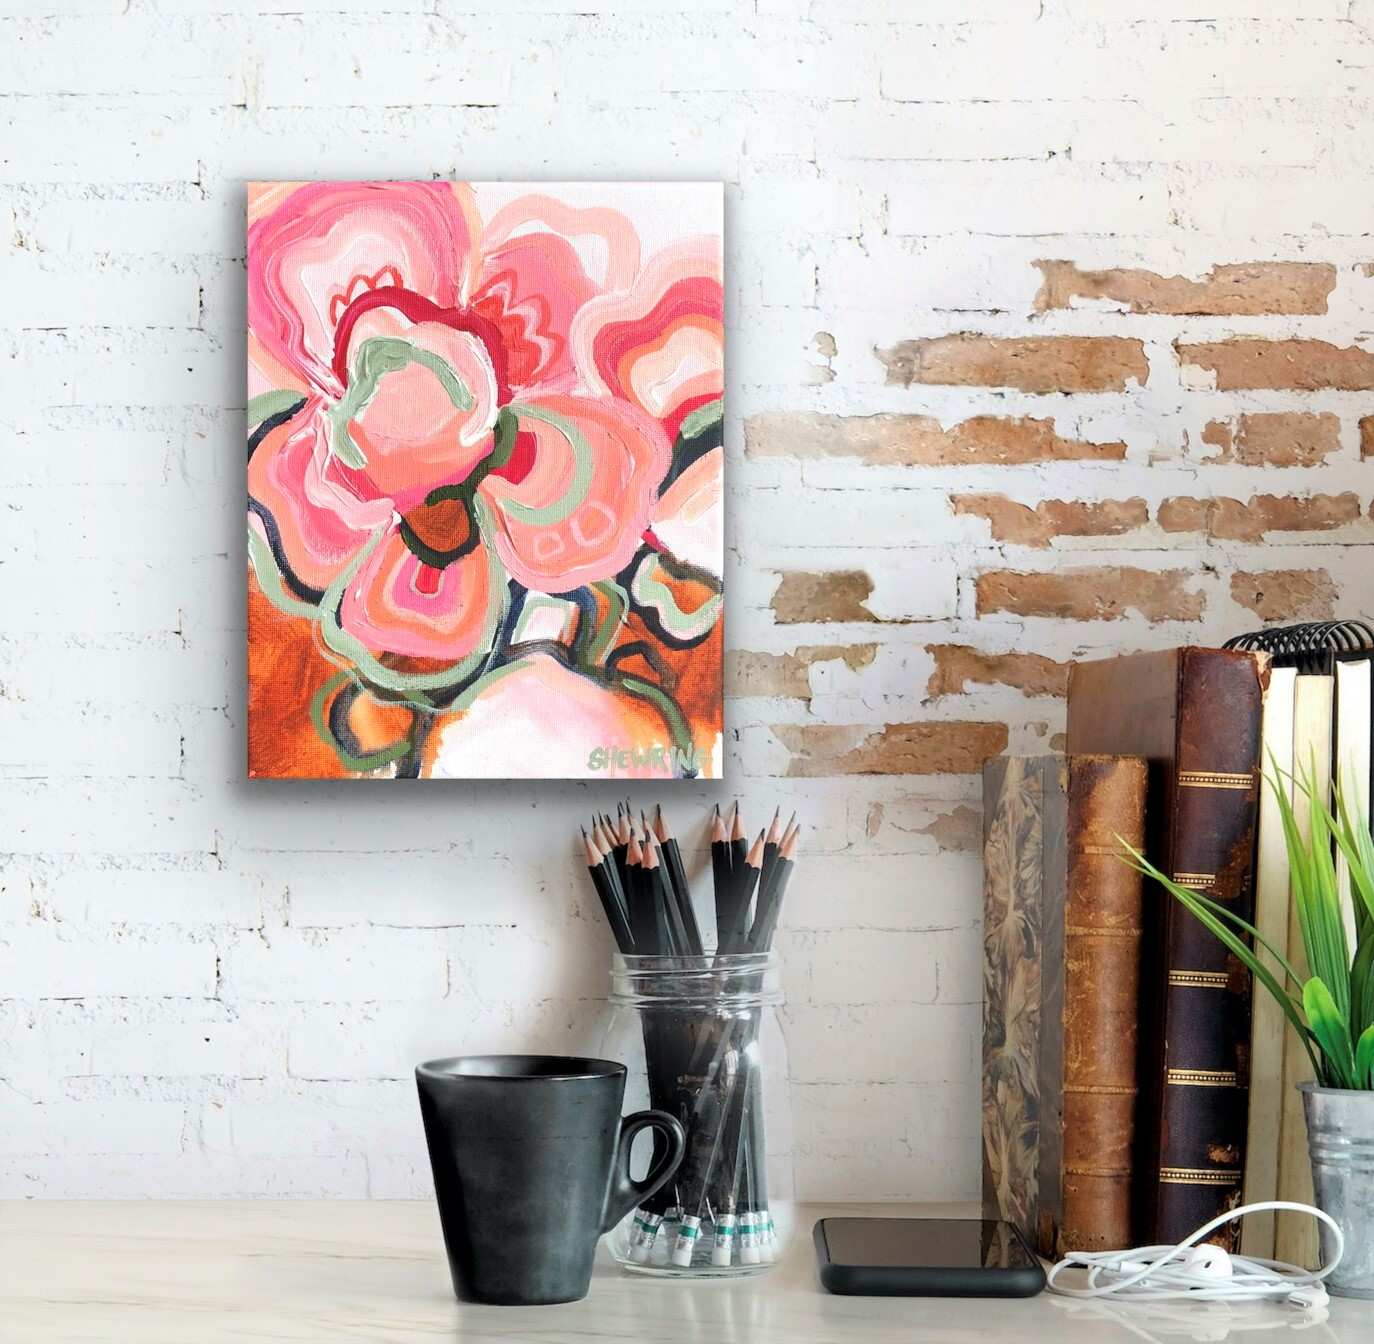 Lovelight Artrooms 1